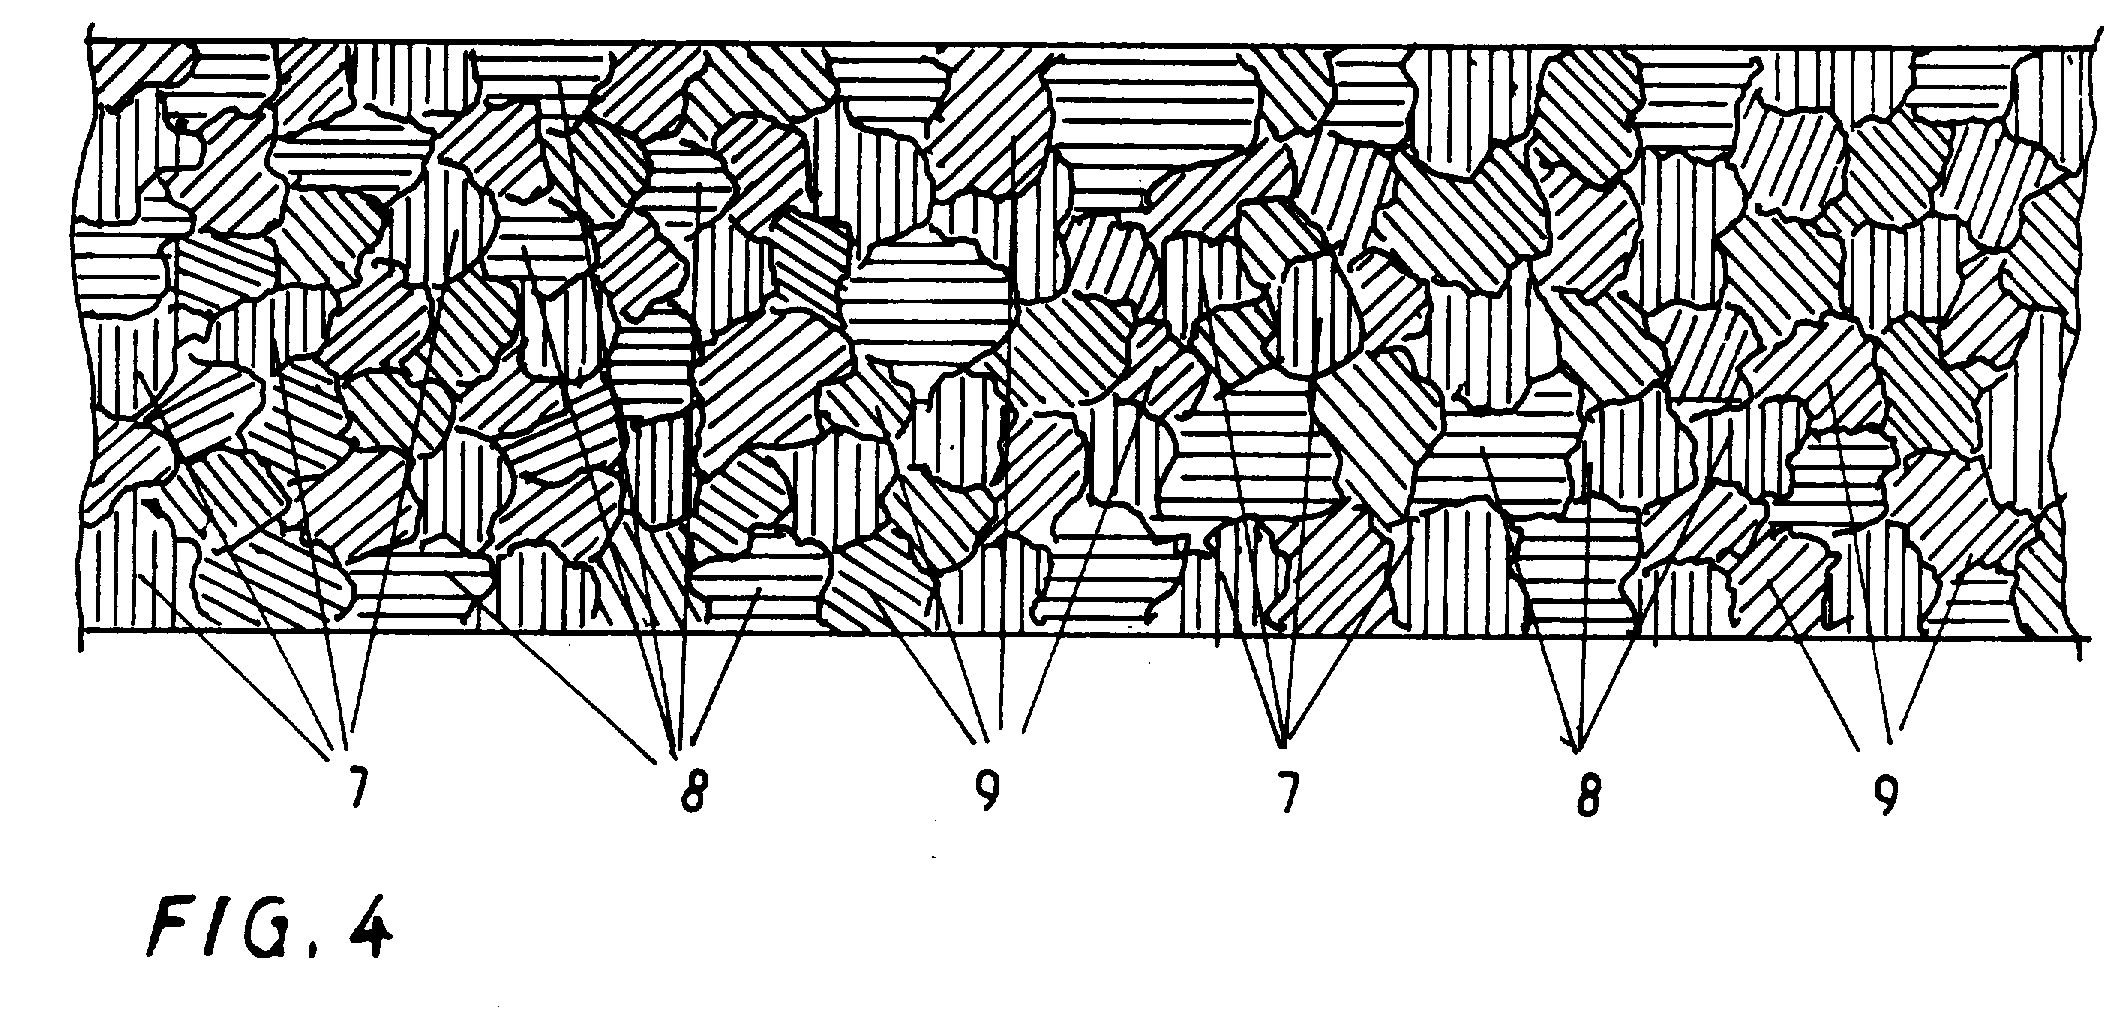 patent ep0387540b1 schwingboden google patents. Black Bedroom Furniture Sets. Home Design Ideas